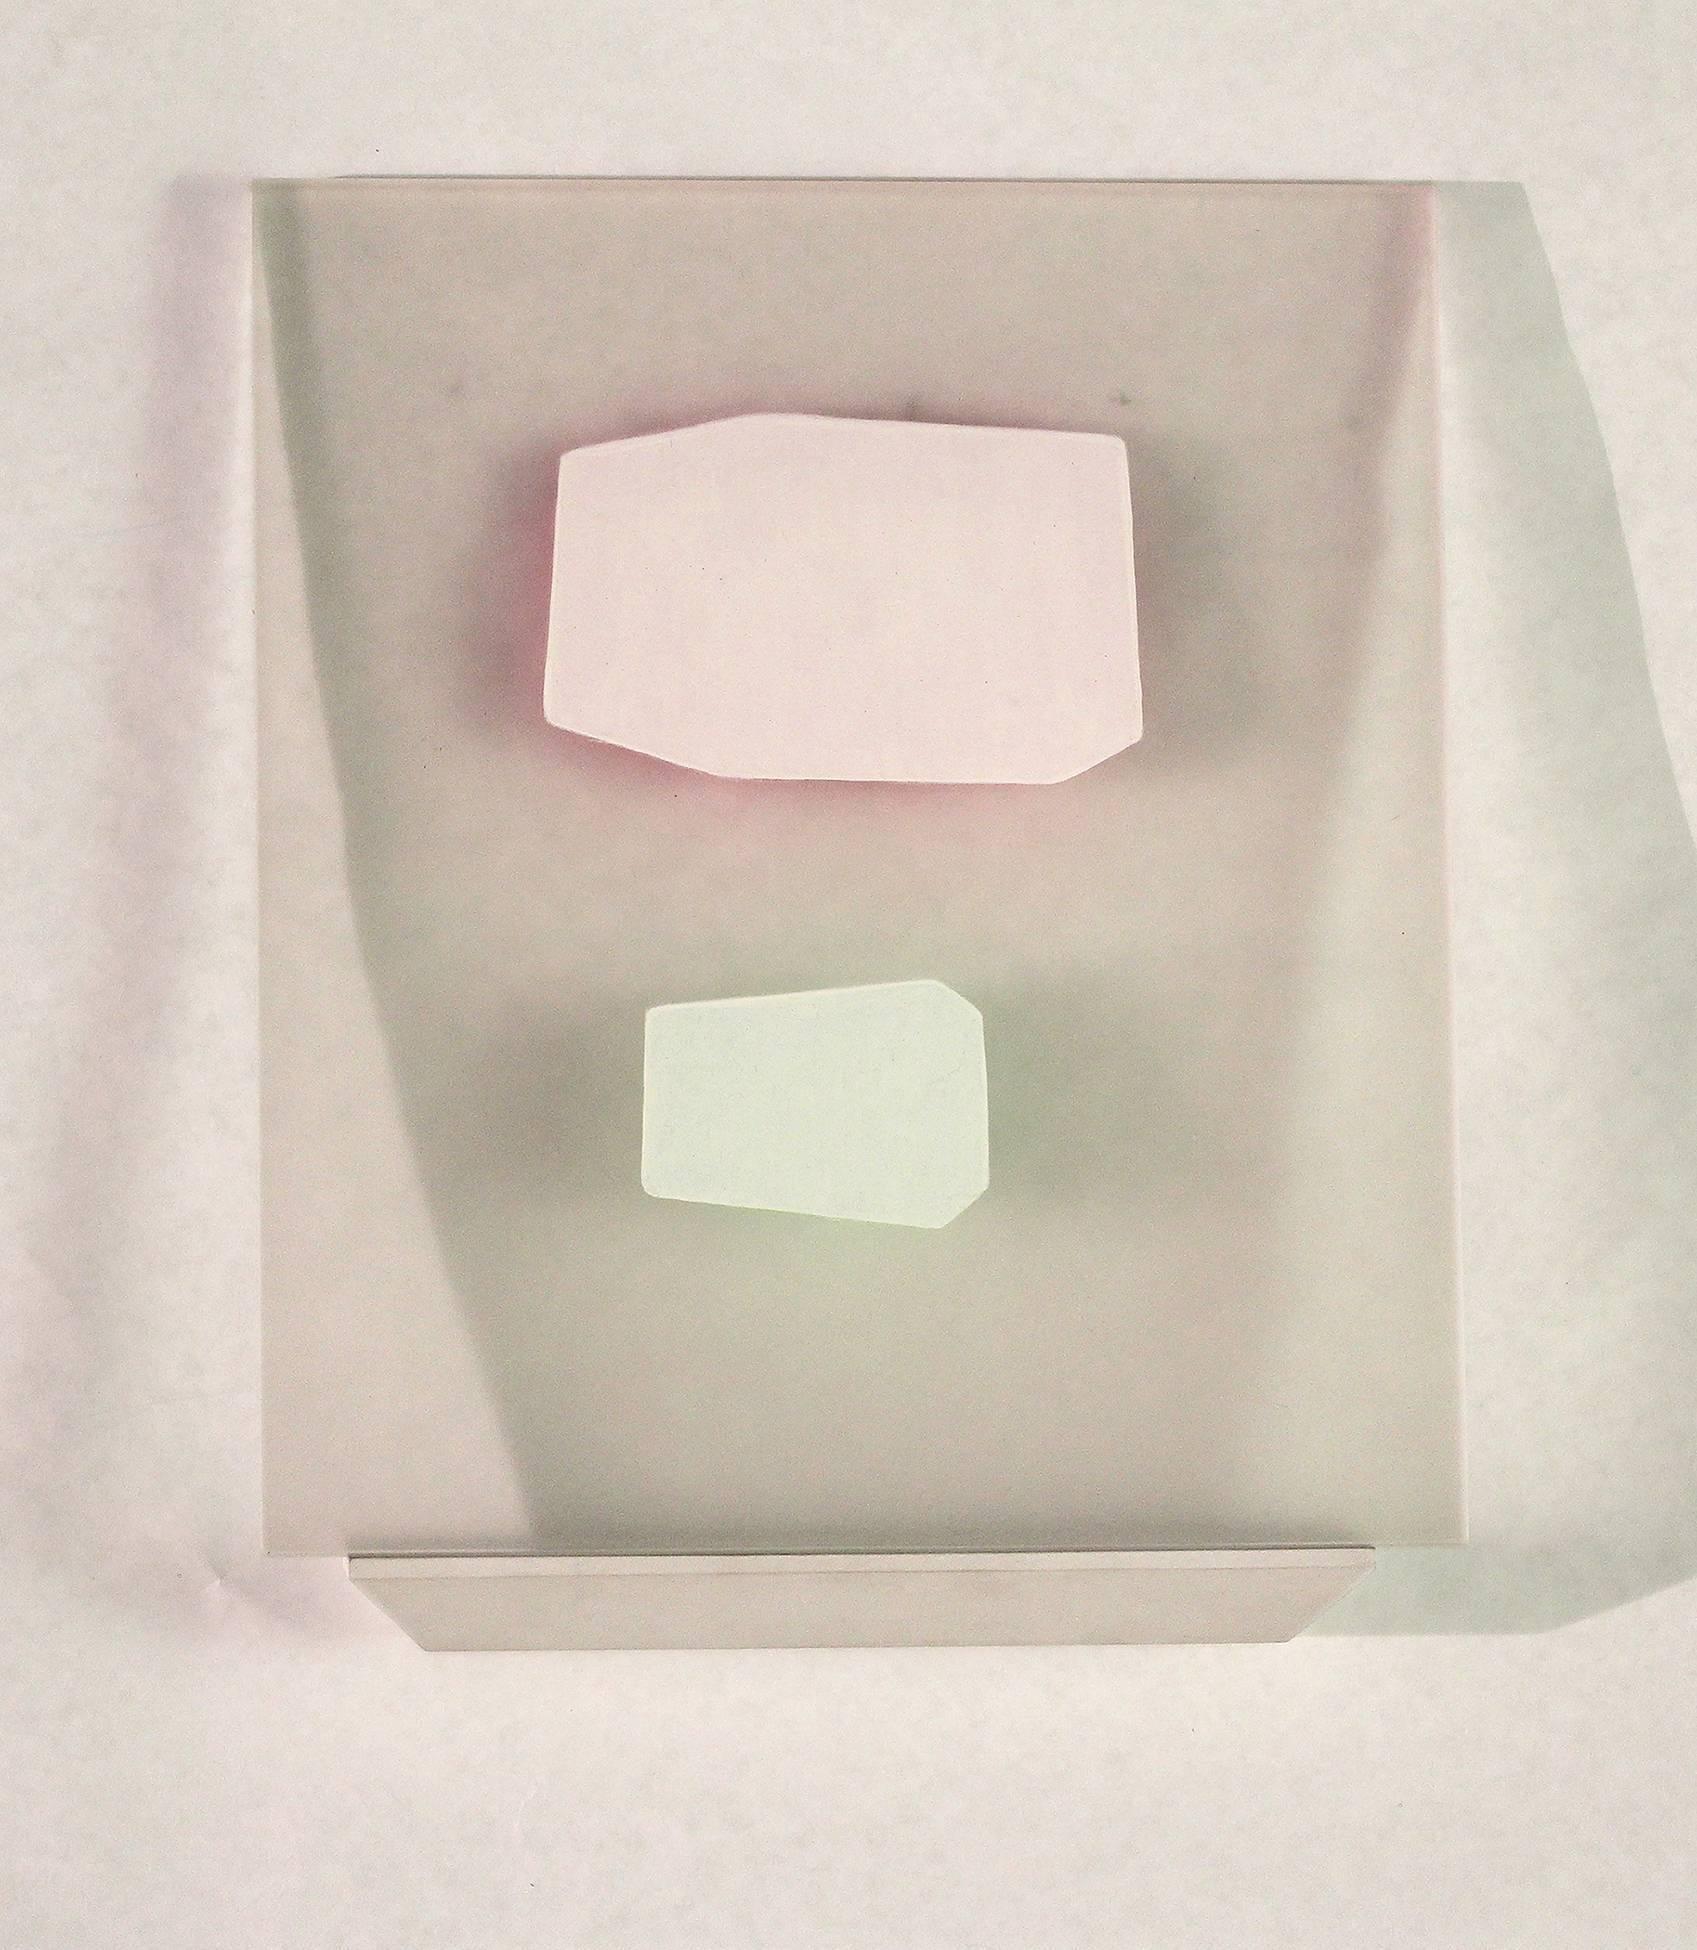 Steven Baris, Ruse Of Transparency 13, 2014, plexiglass, acrylic paint